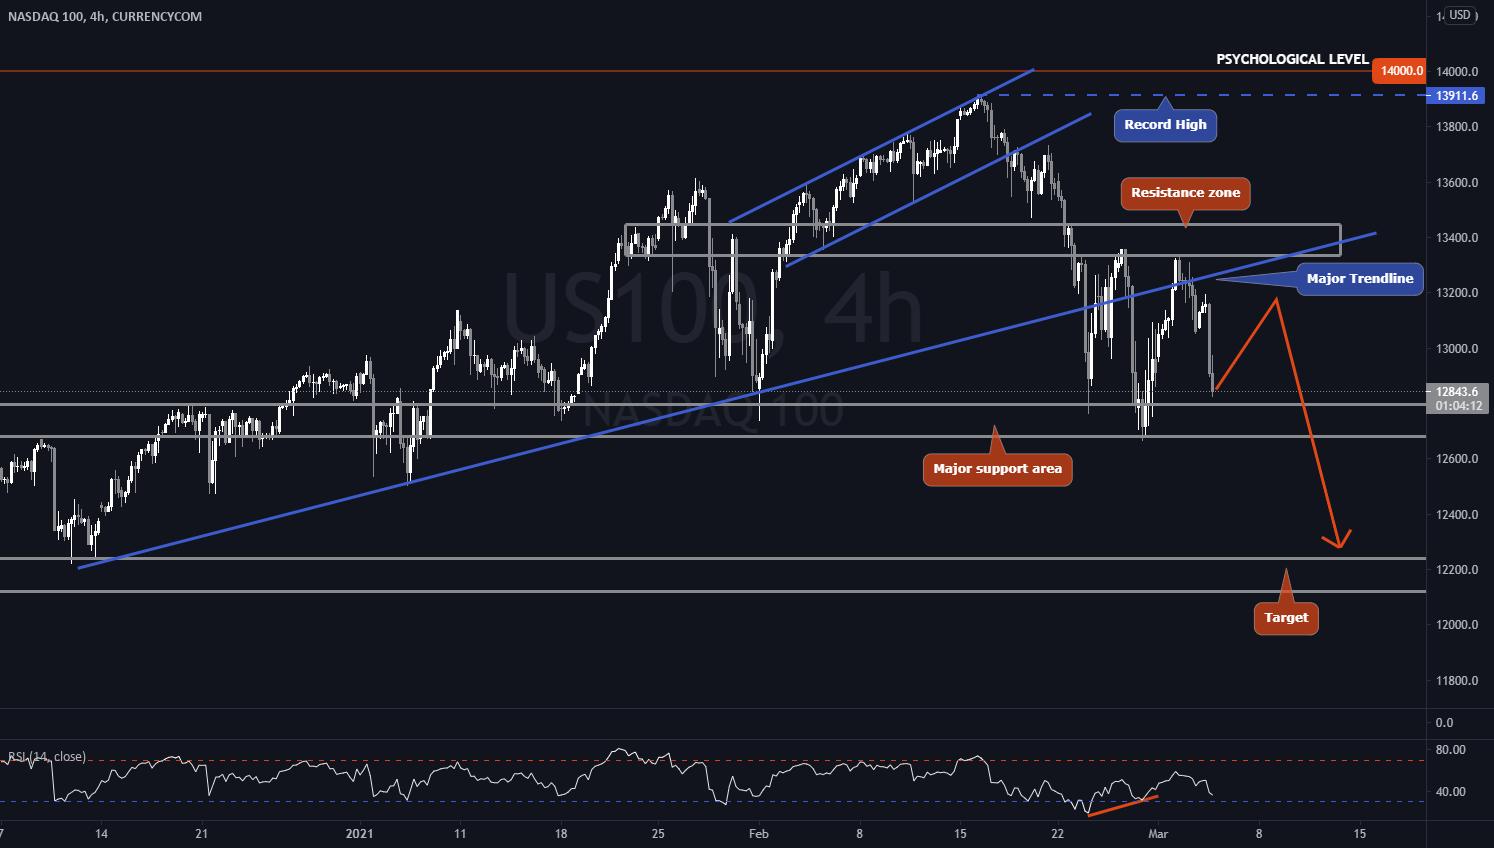 NASDAQ 100 (US100) - Week 9 - Under huge bearish pressure ...